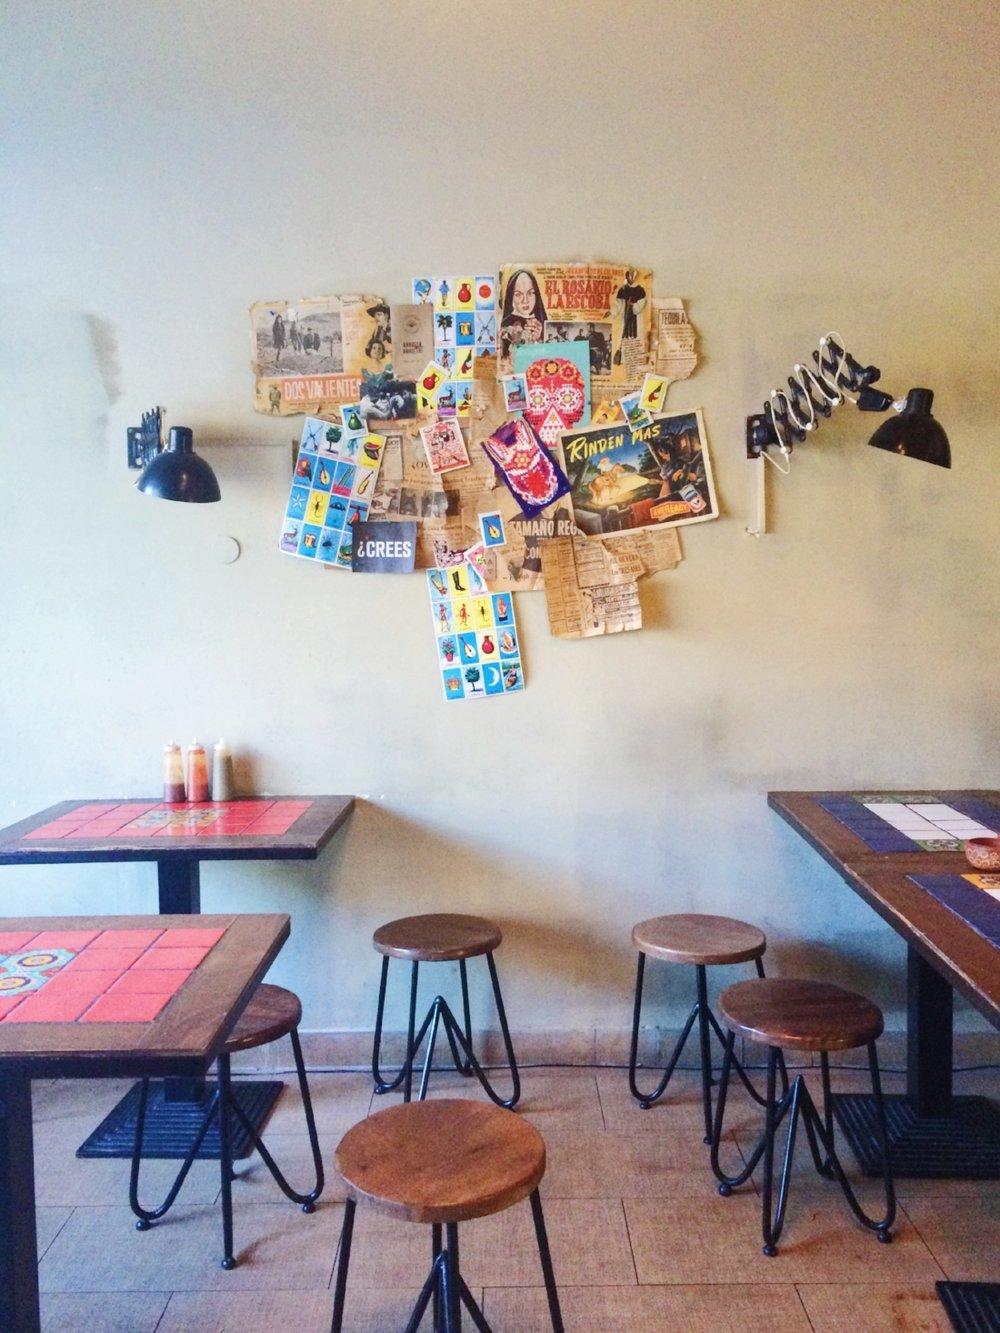 Chaparro Cocina Mexicana / Kreuzberg, Berlin / Germany